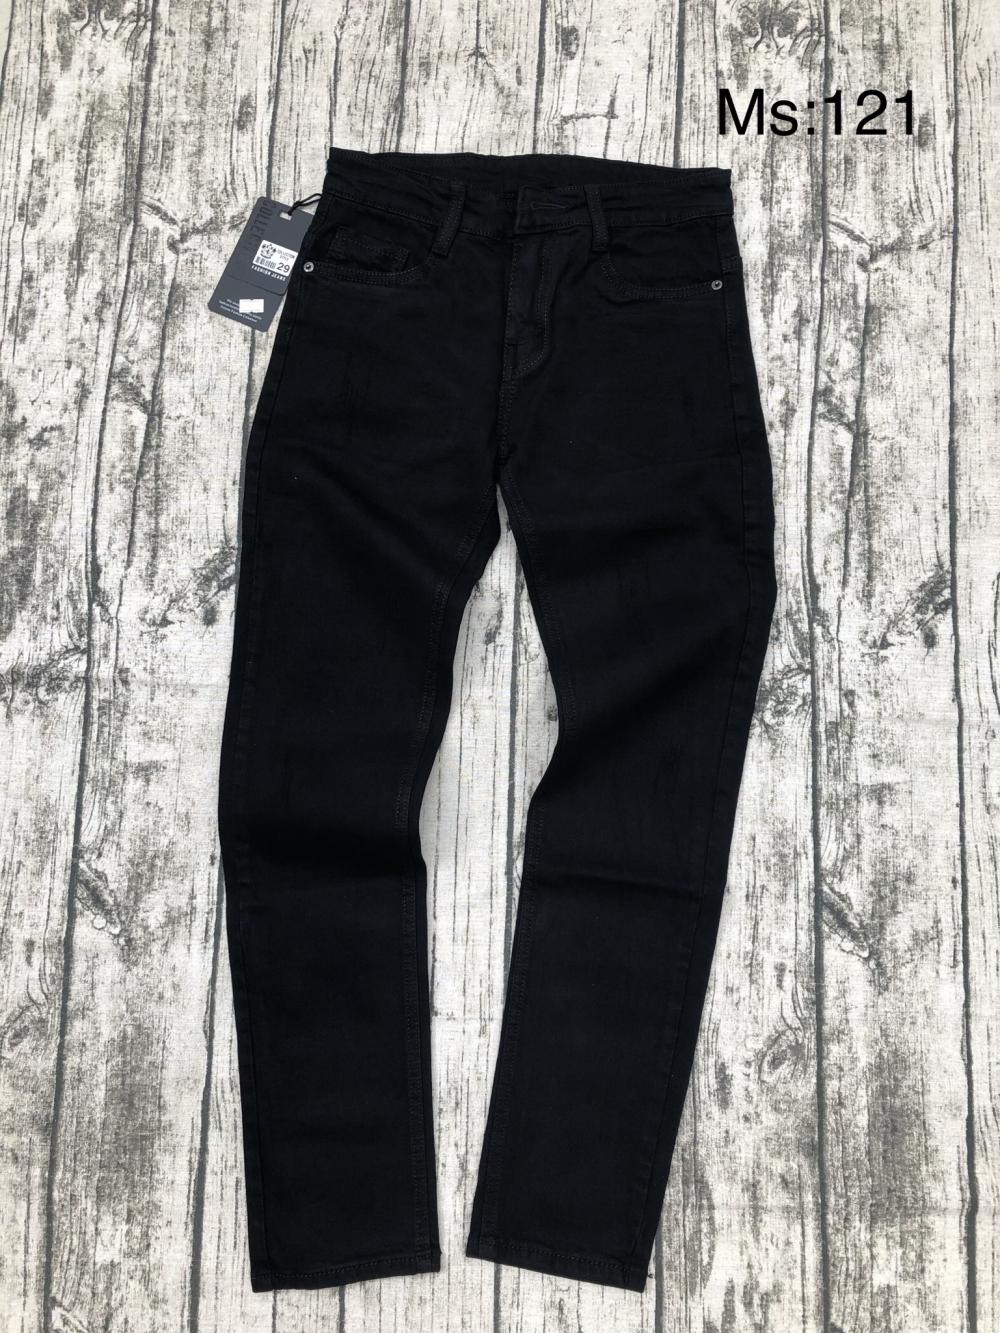 Quần jean nam dài MS121